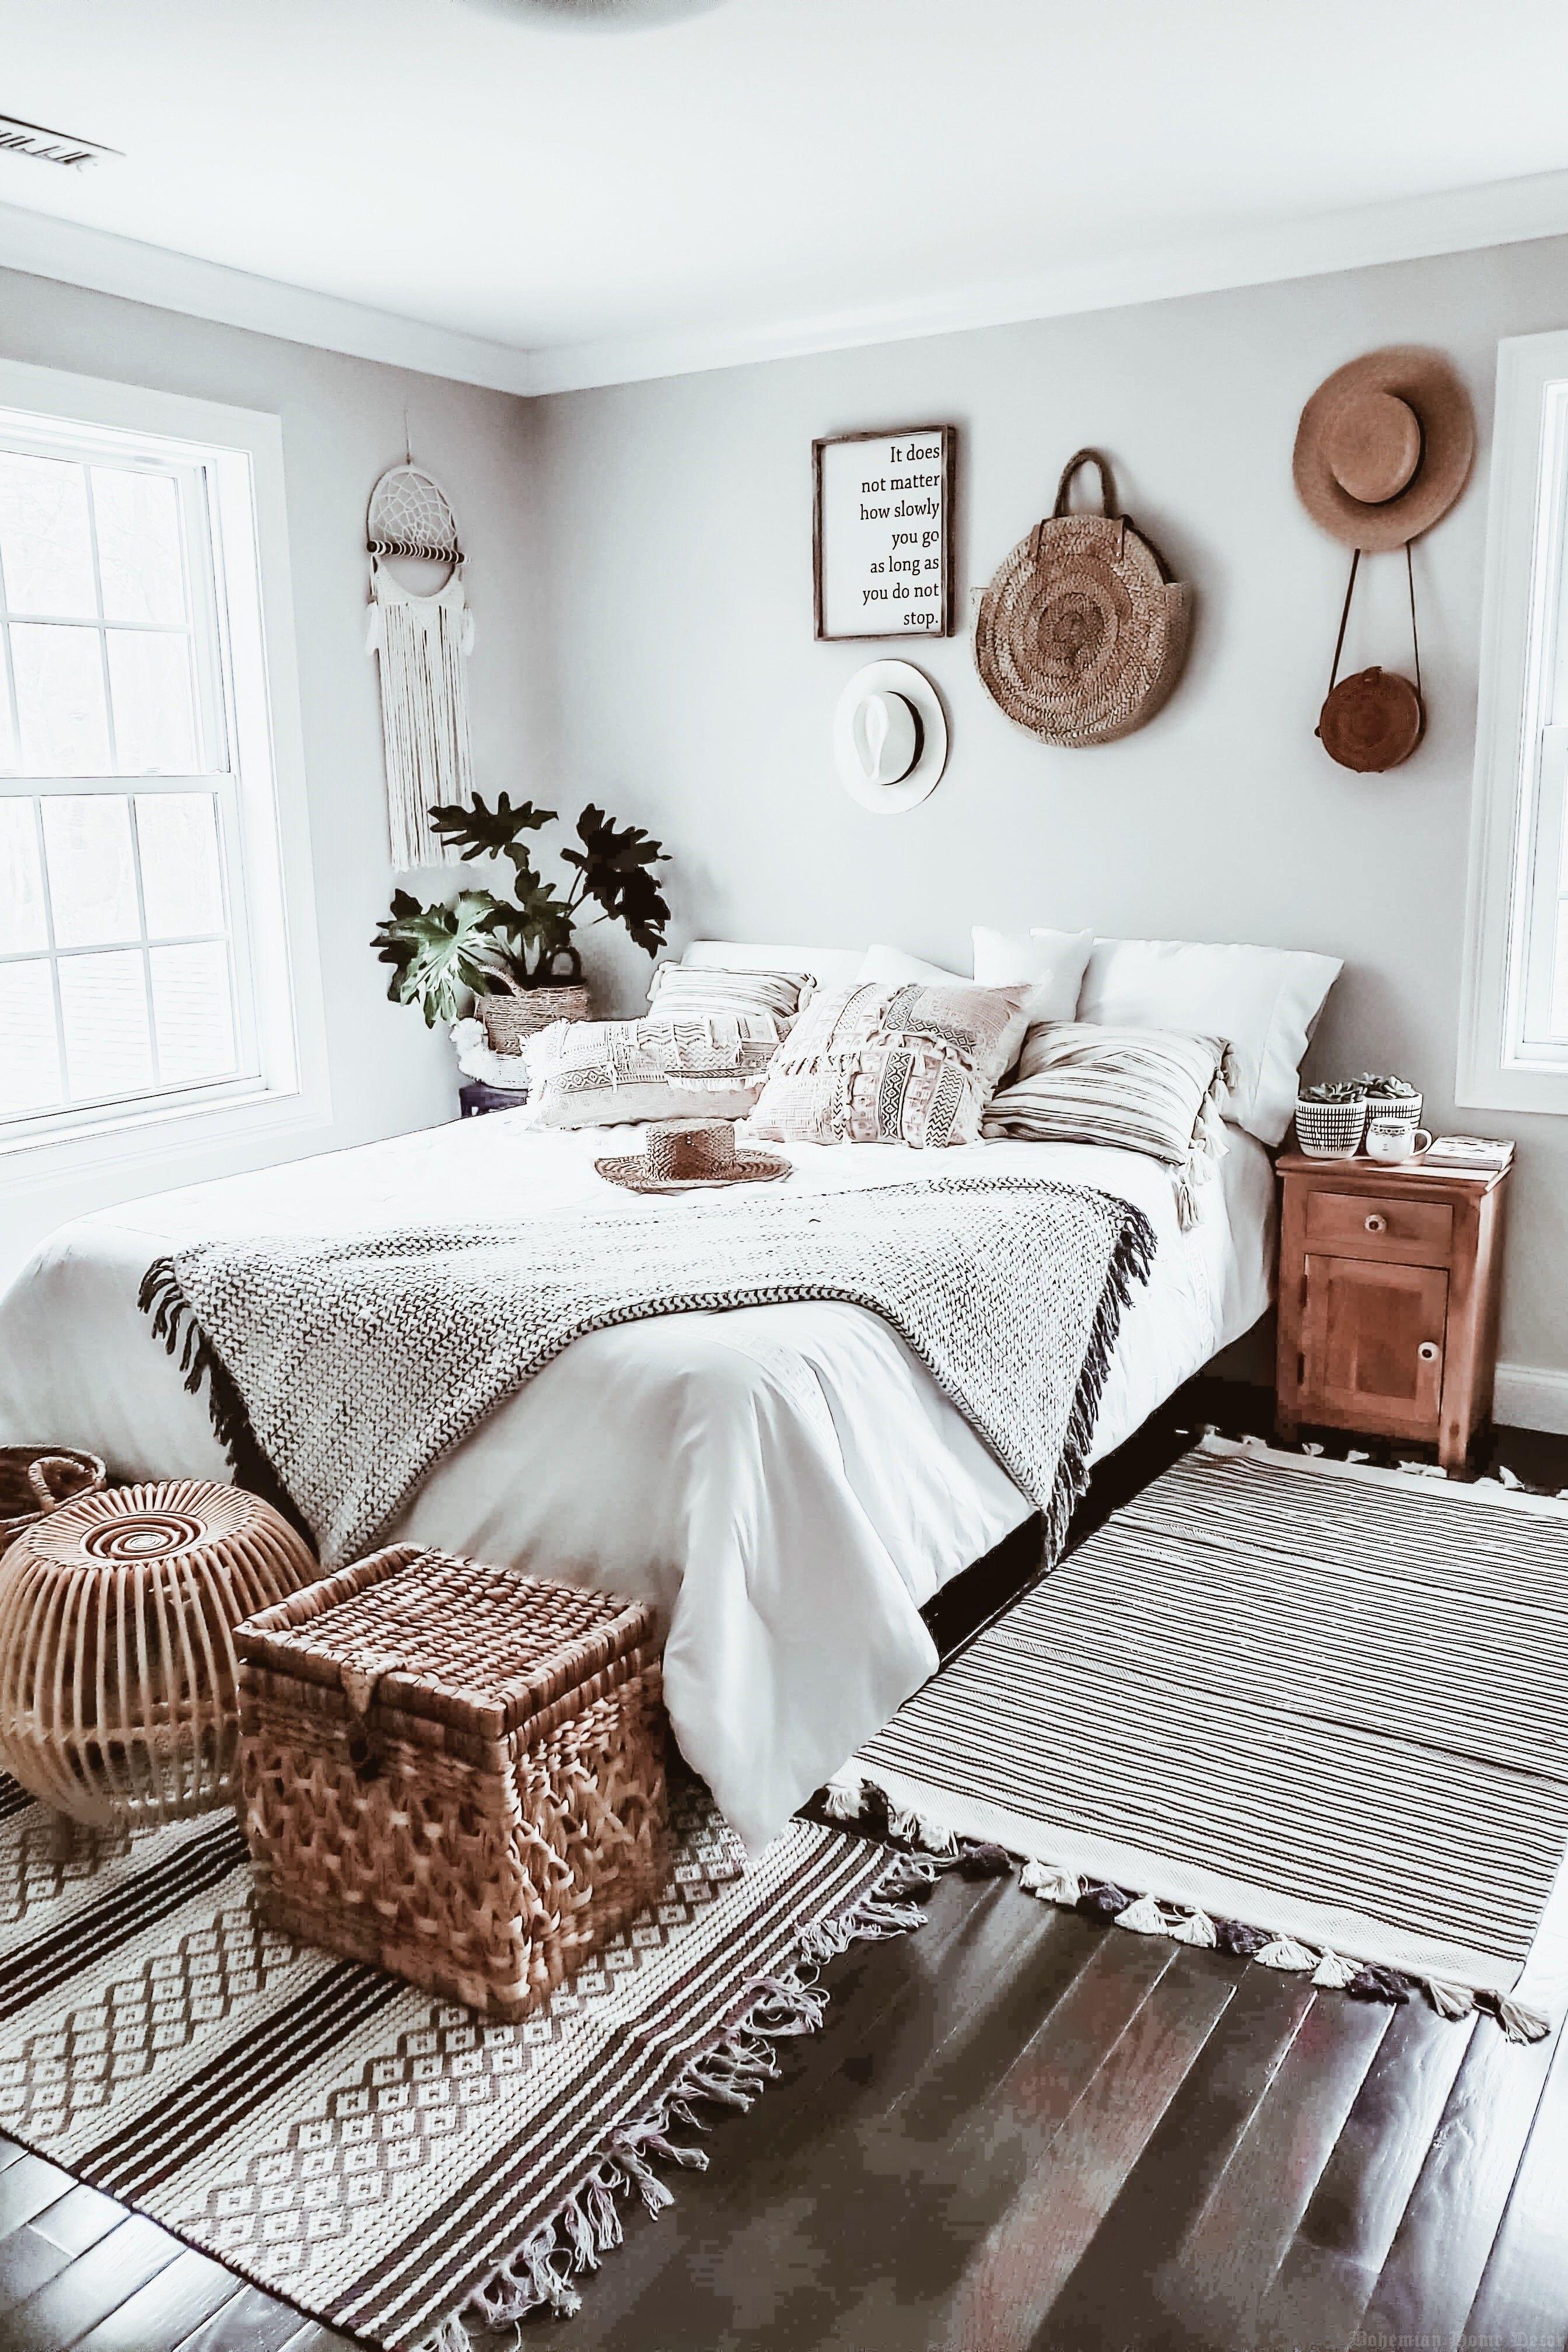 Savvy|Smart People Do Bohemian Home Decor :) Oct 2020